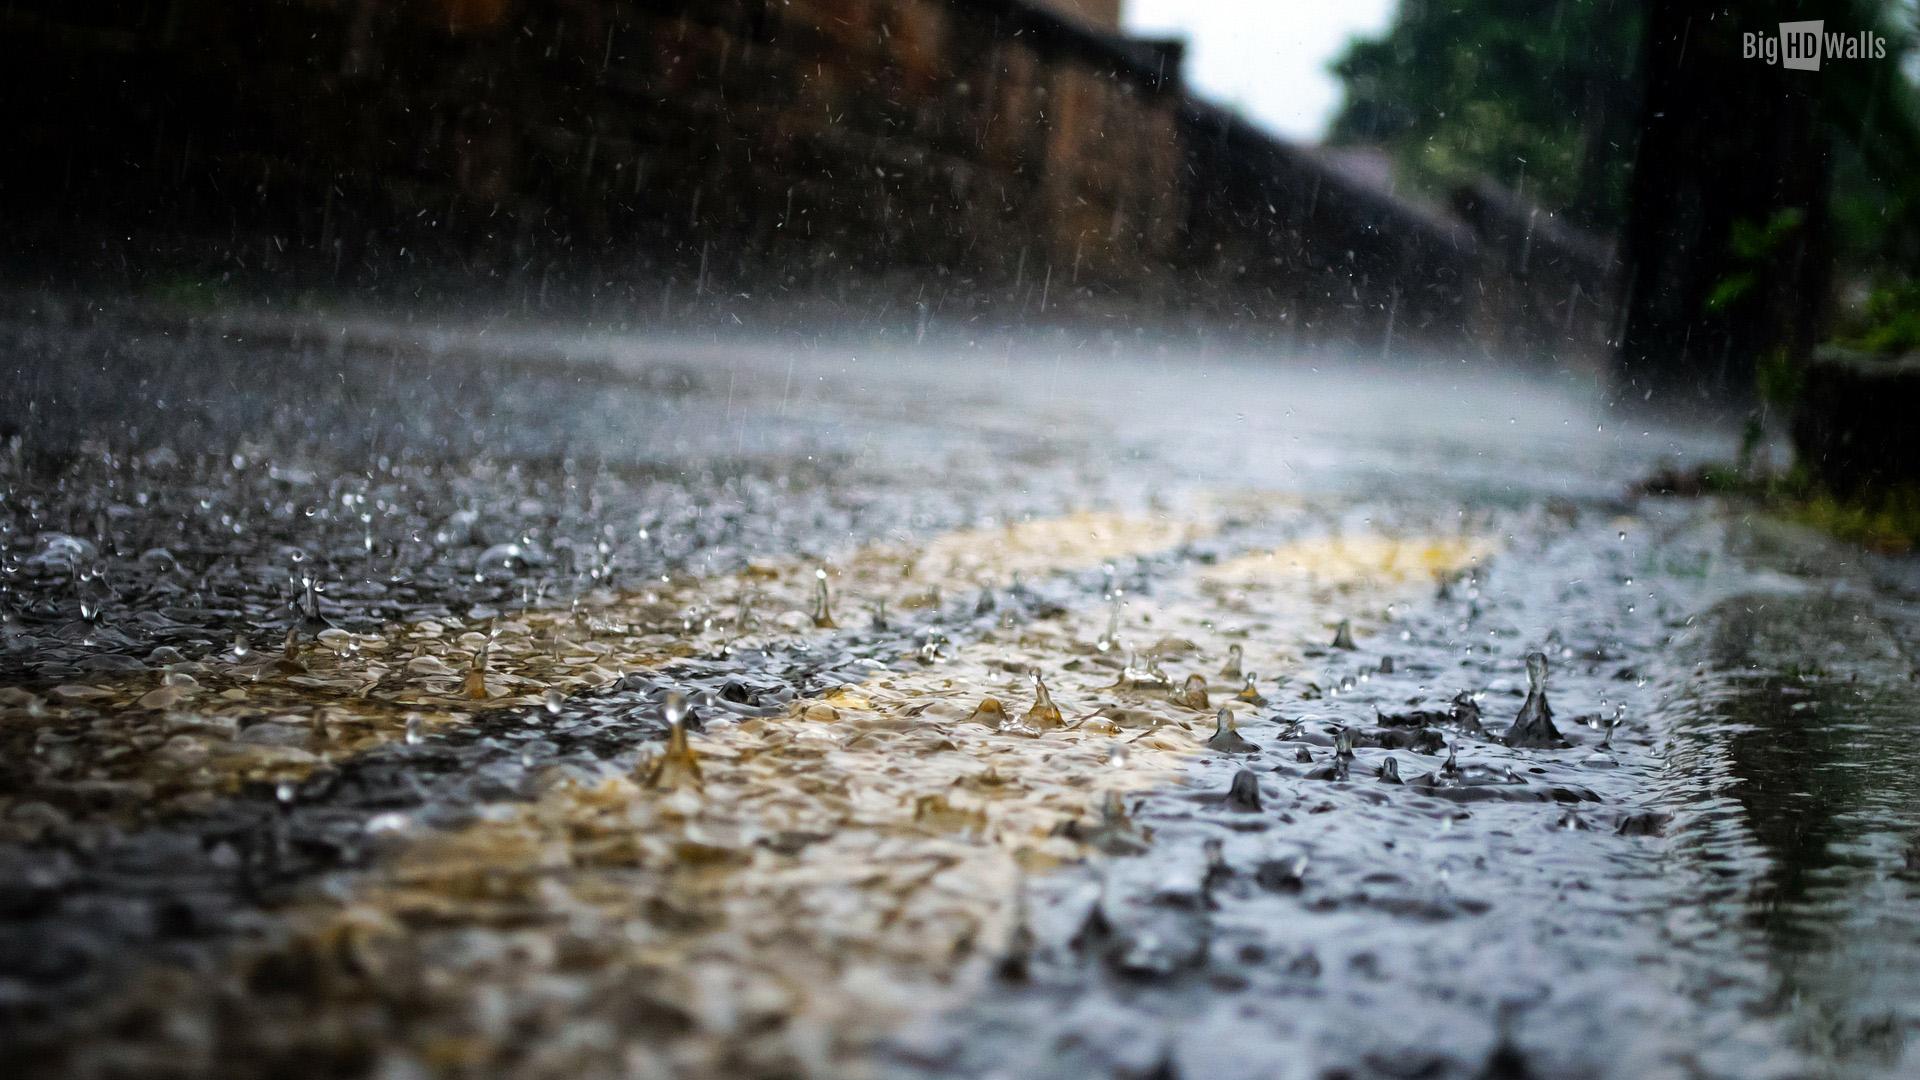 Hd wallpaper rain - Rainy Day Wallpaper